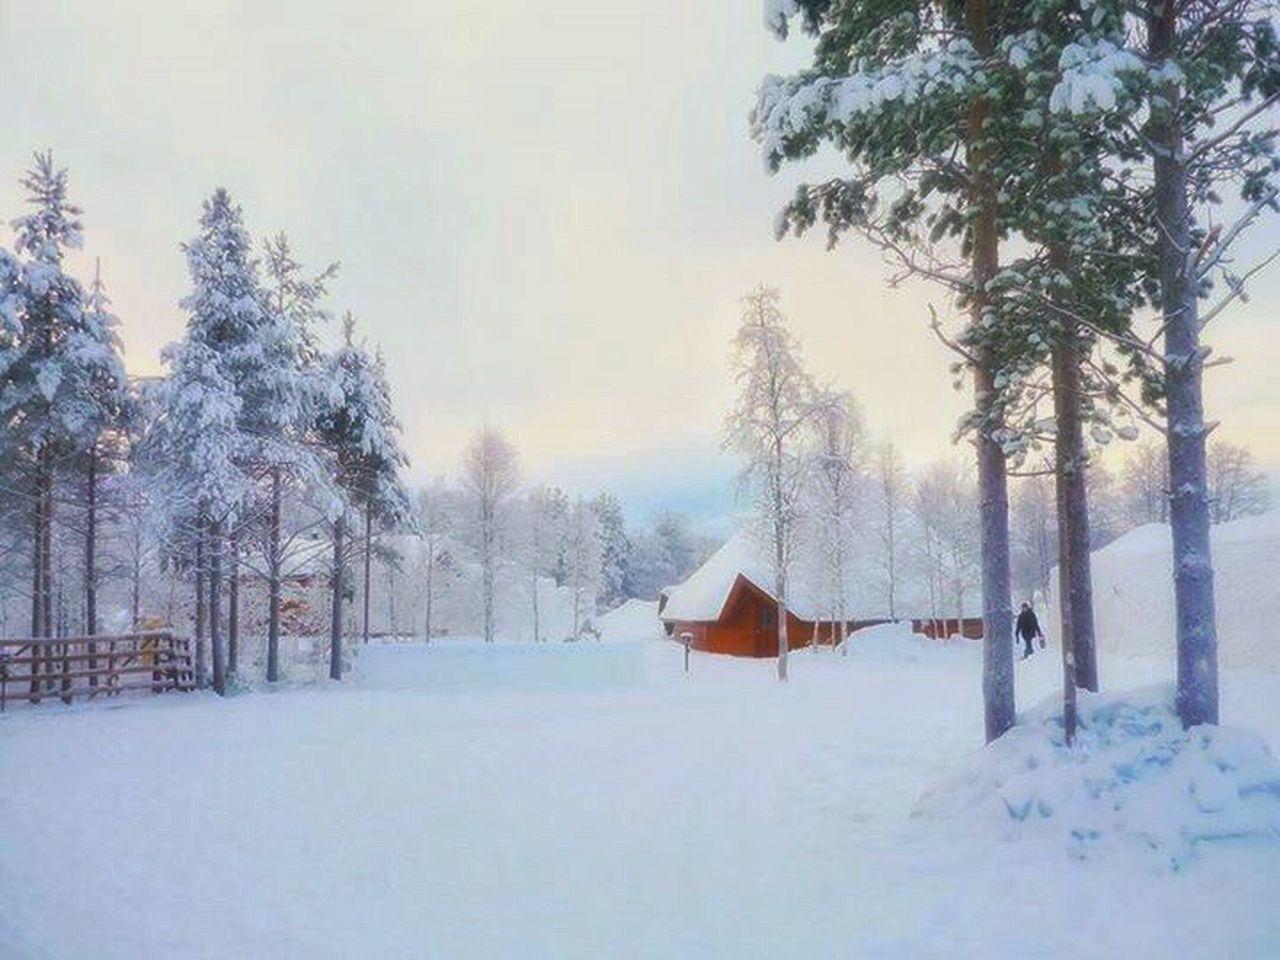 Pastel Power Rovaniemi, Finland Rovaniemi Sojourn IntotheArticCircle Aurora Chasing Winterwonderland Winterinlaplandfinland Winterinfinland2016 LLLimages Dreamylandscapes Christmaspostcards Showcase March IPS2016White